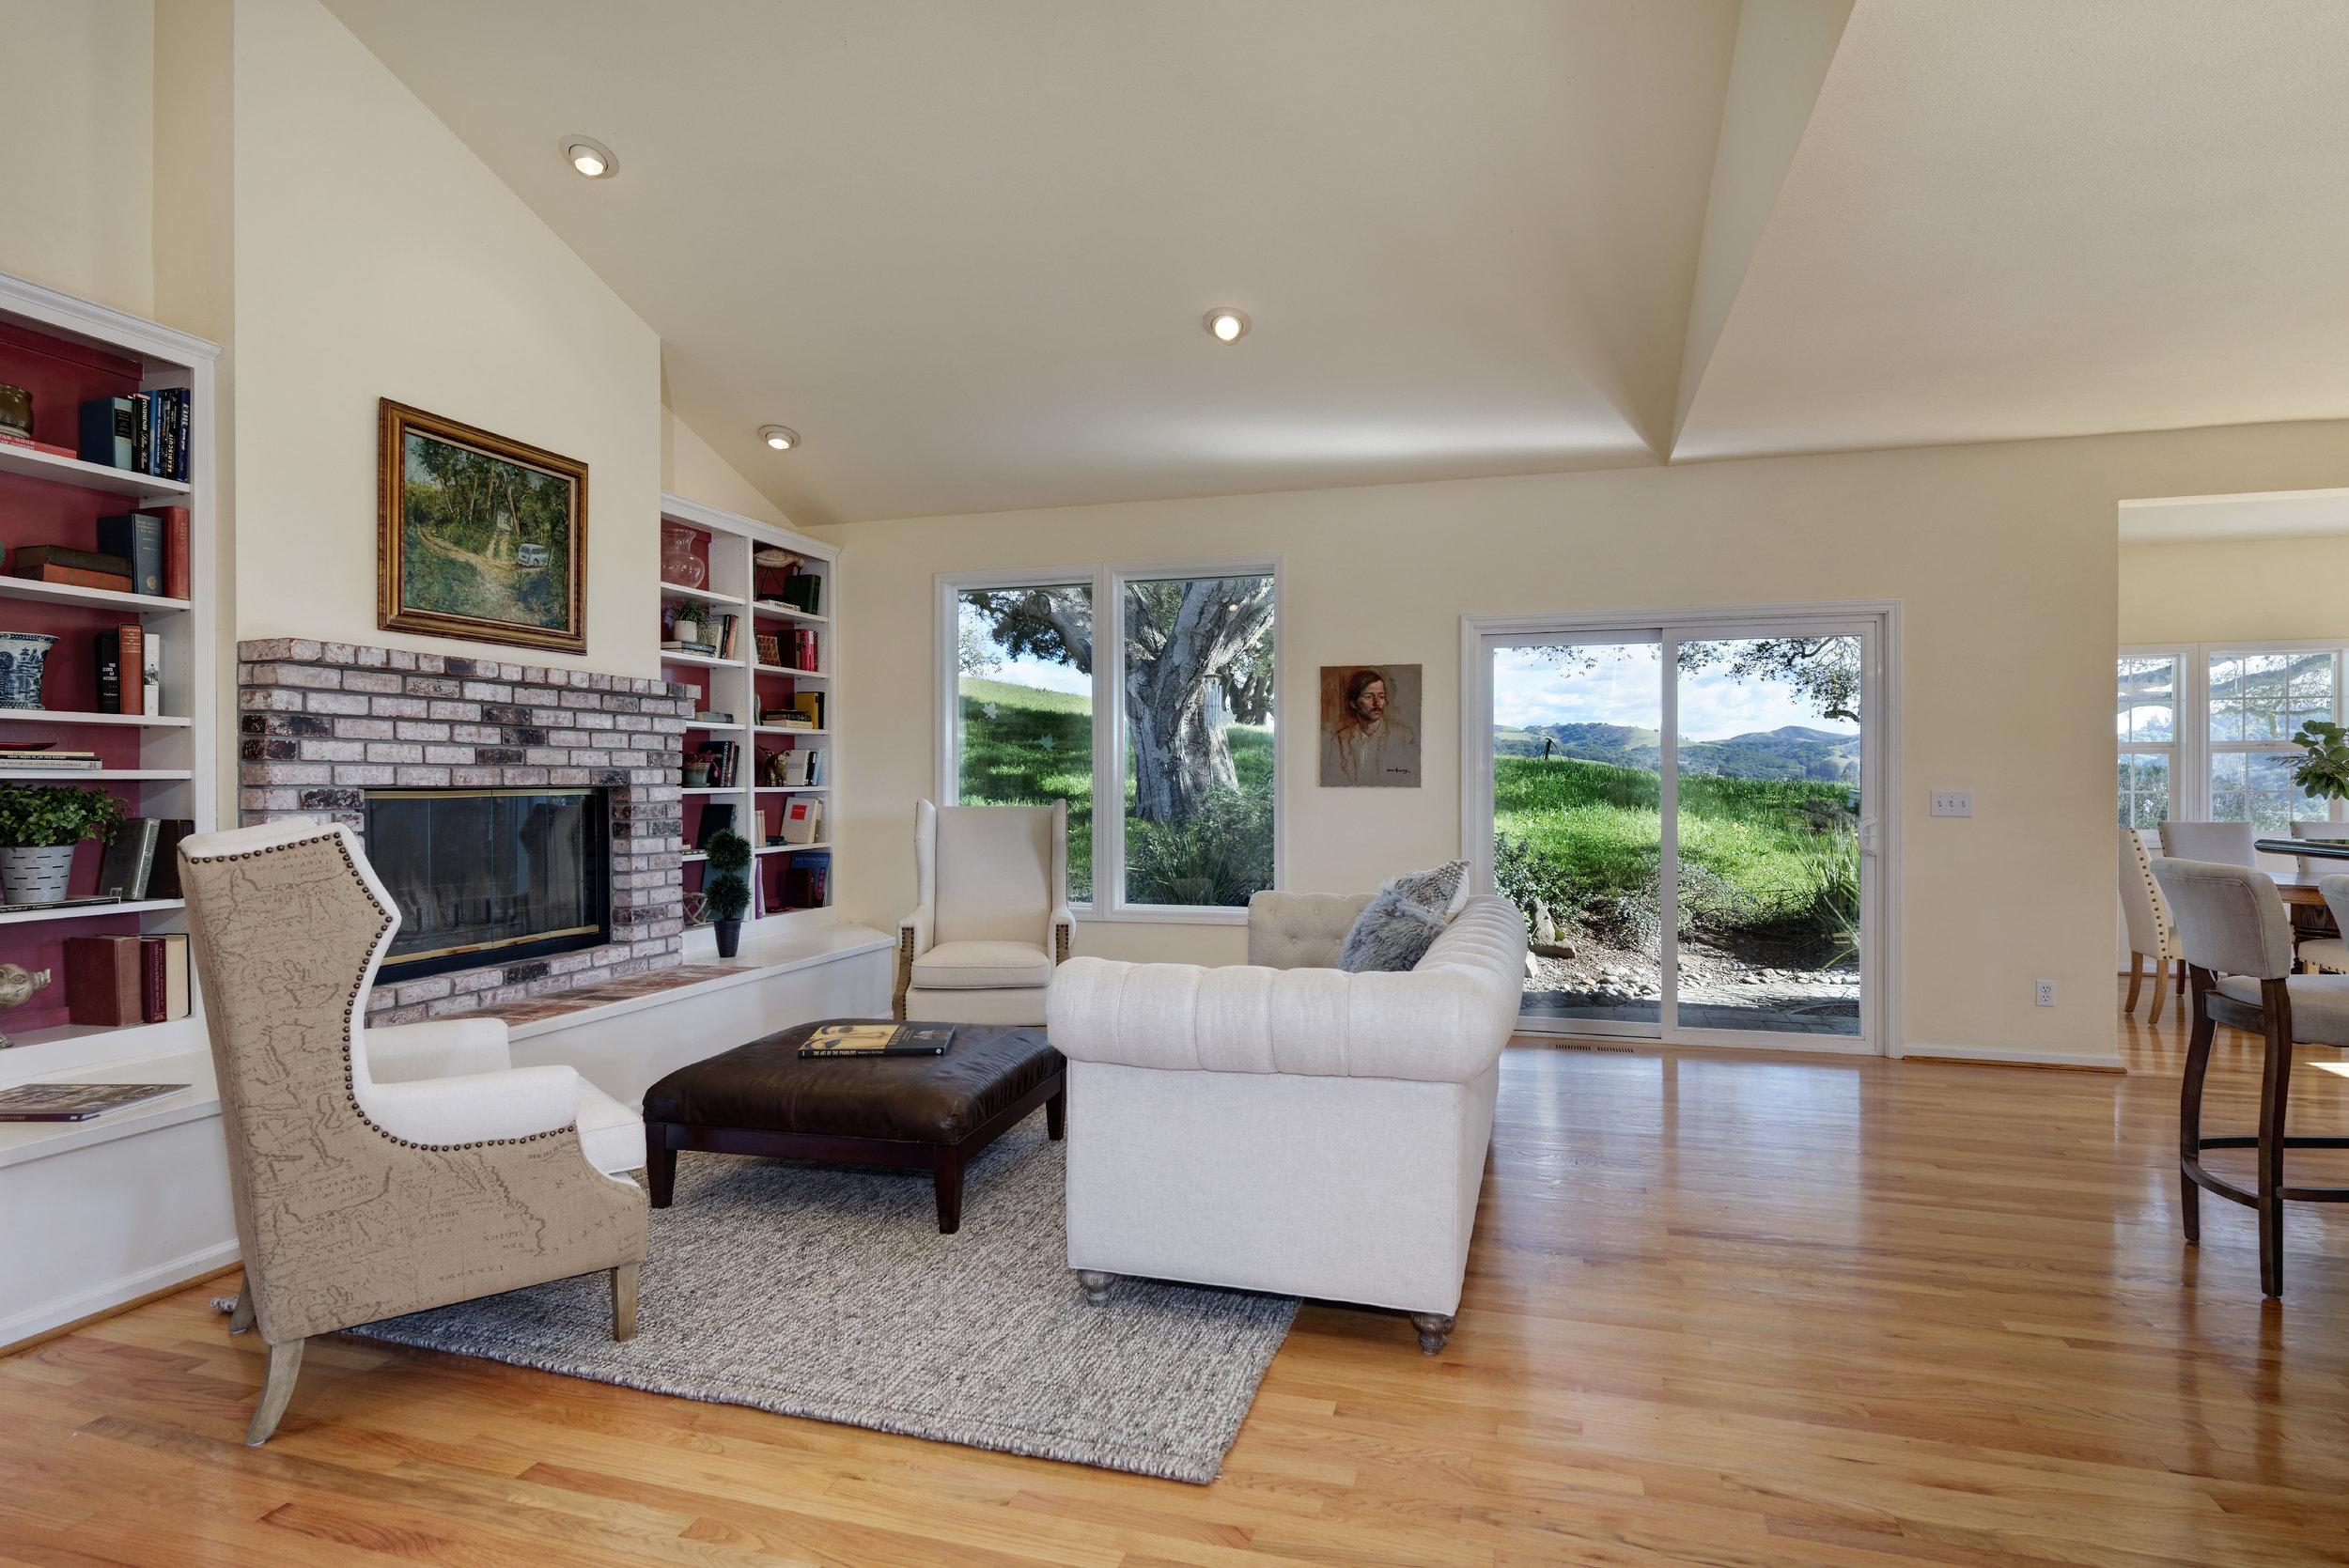 Living_706 Carpenteria R_Ducky Grabill Real Estate (1).jpg